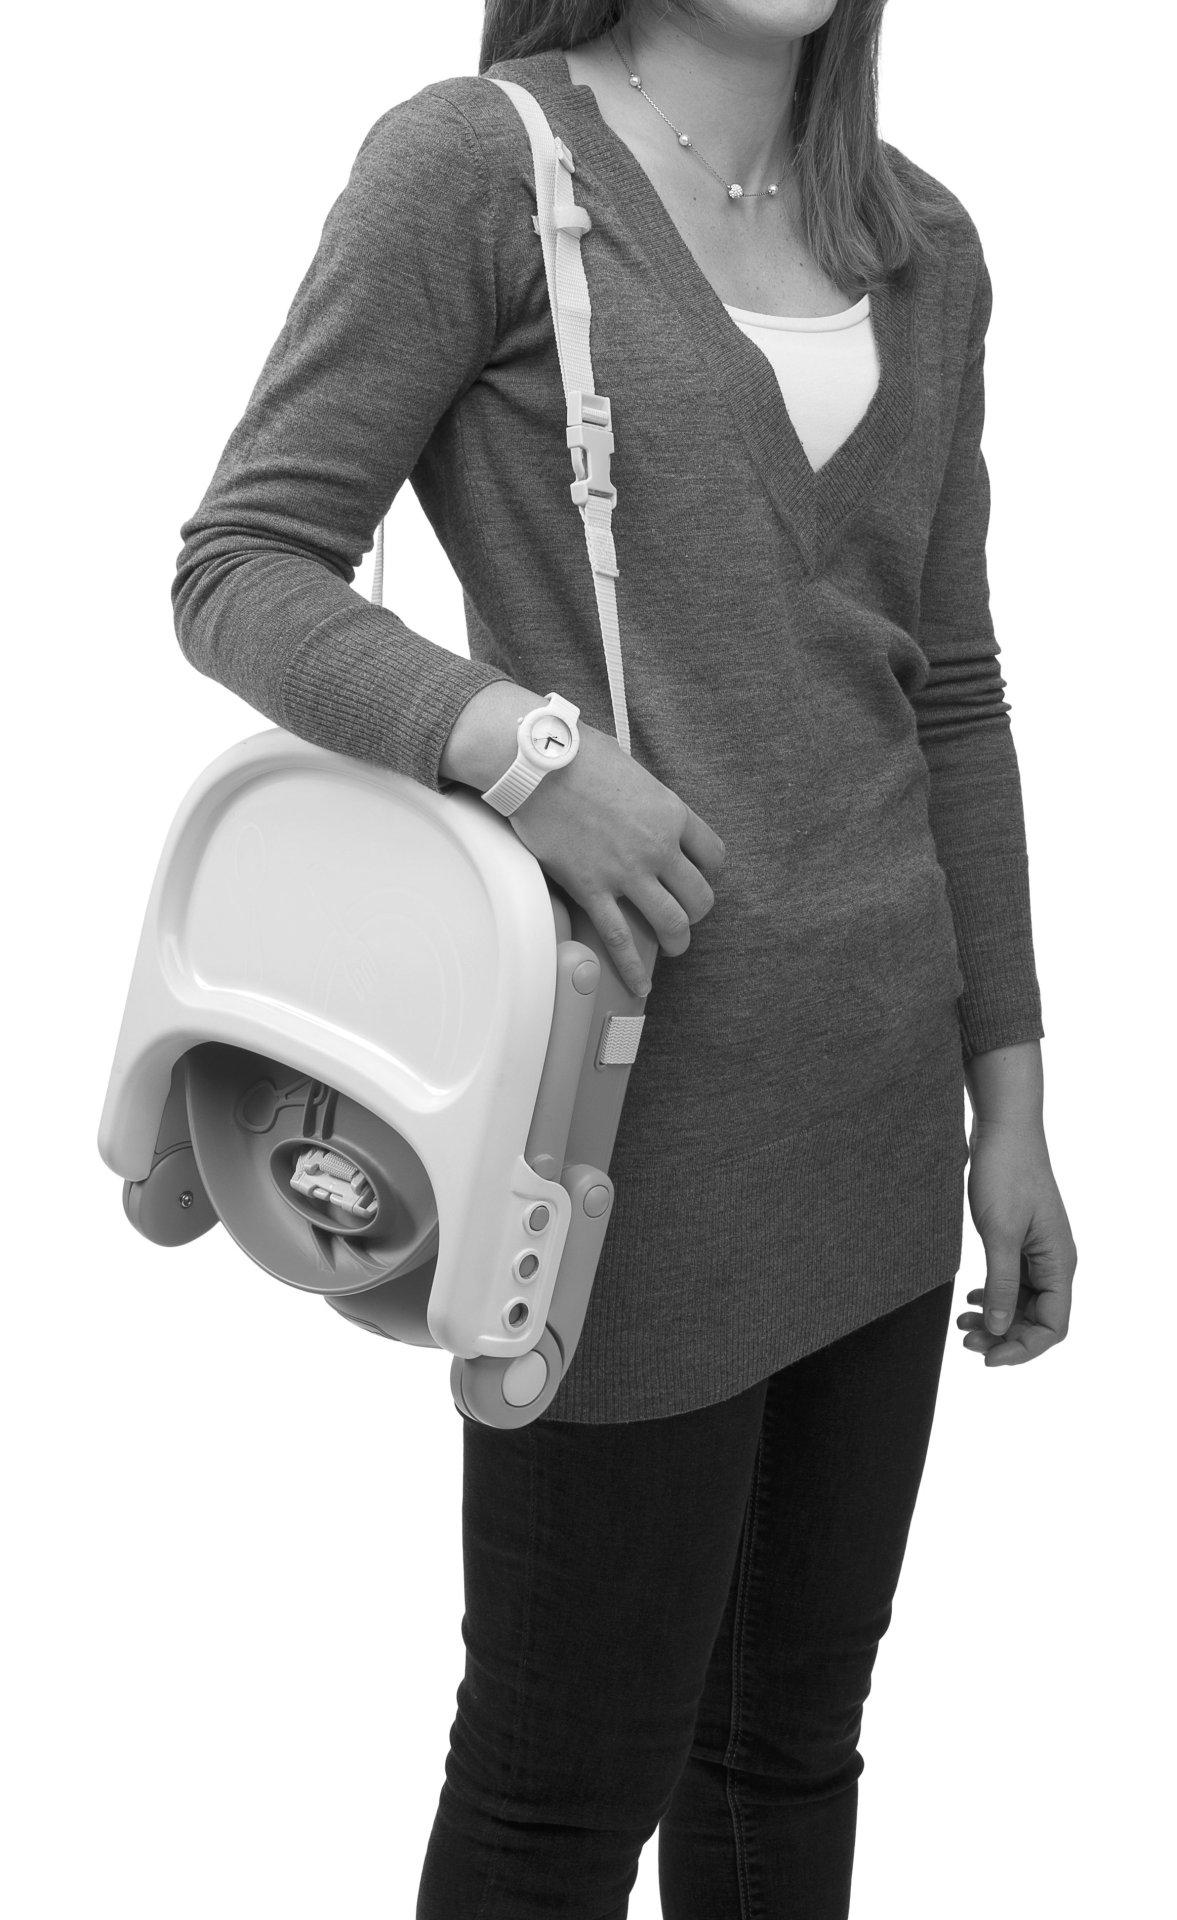 Chicco Booster Seat Pocket Snack 2018 Dark Grey Buy at